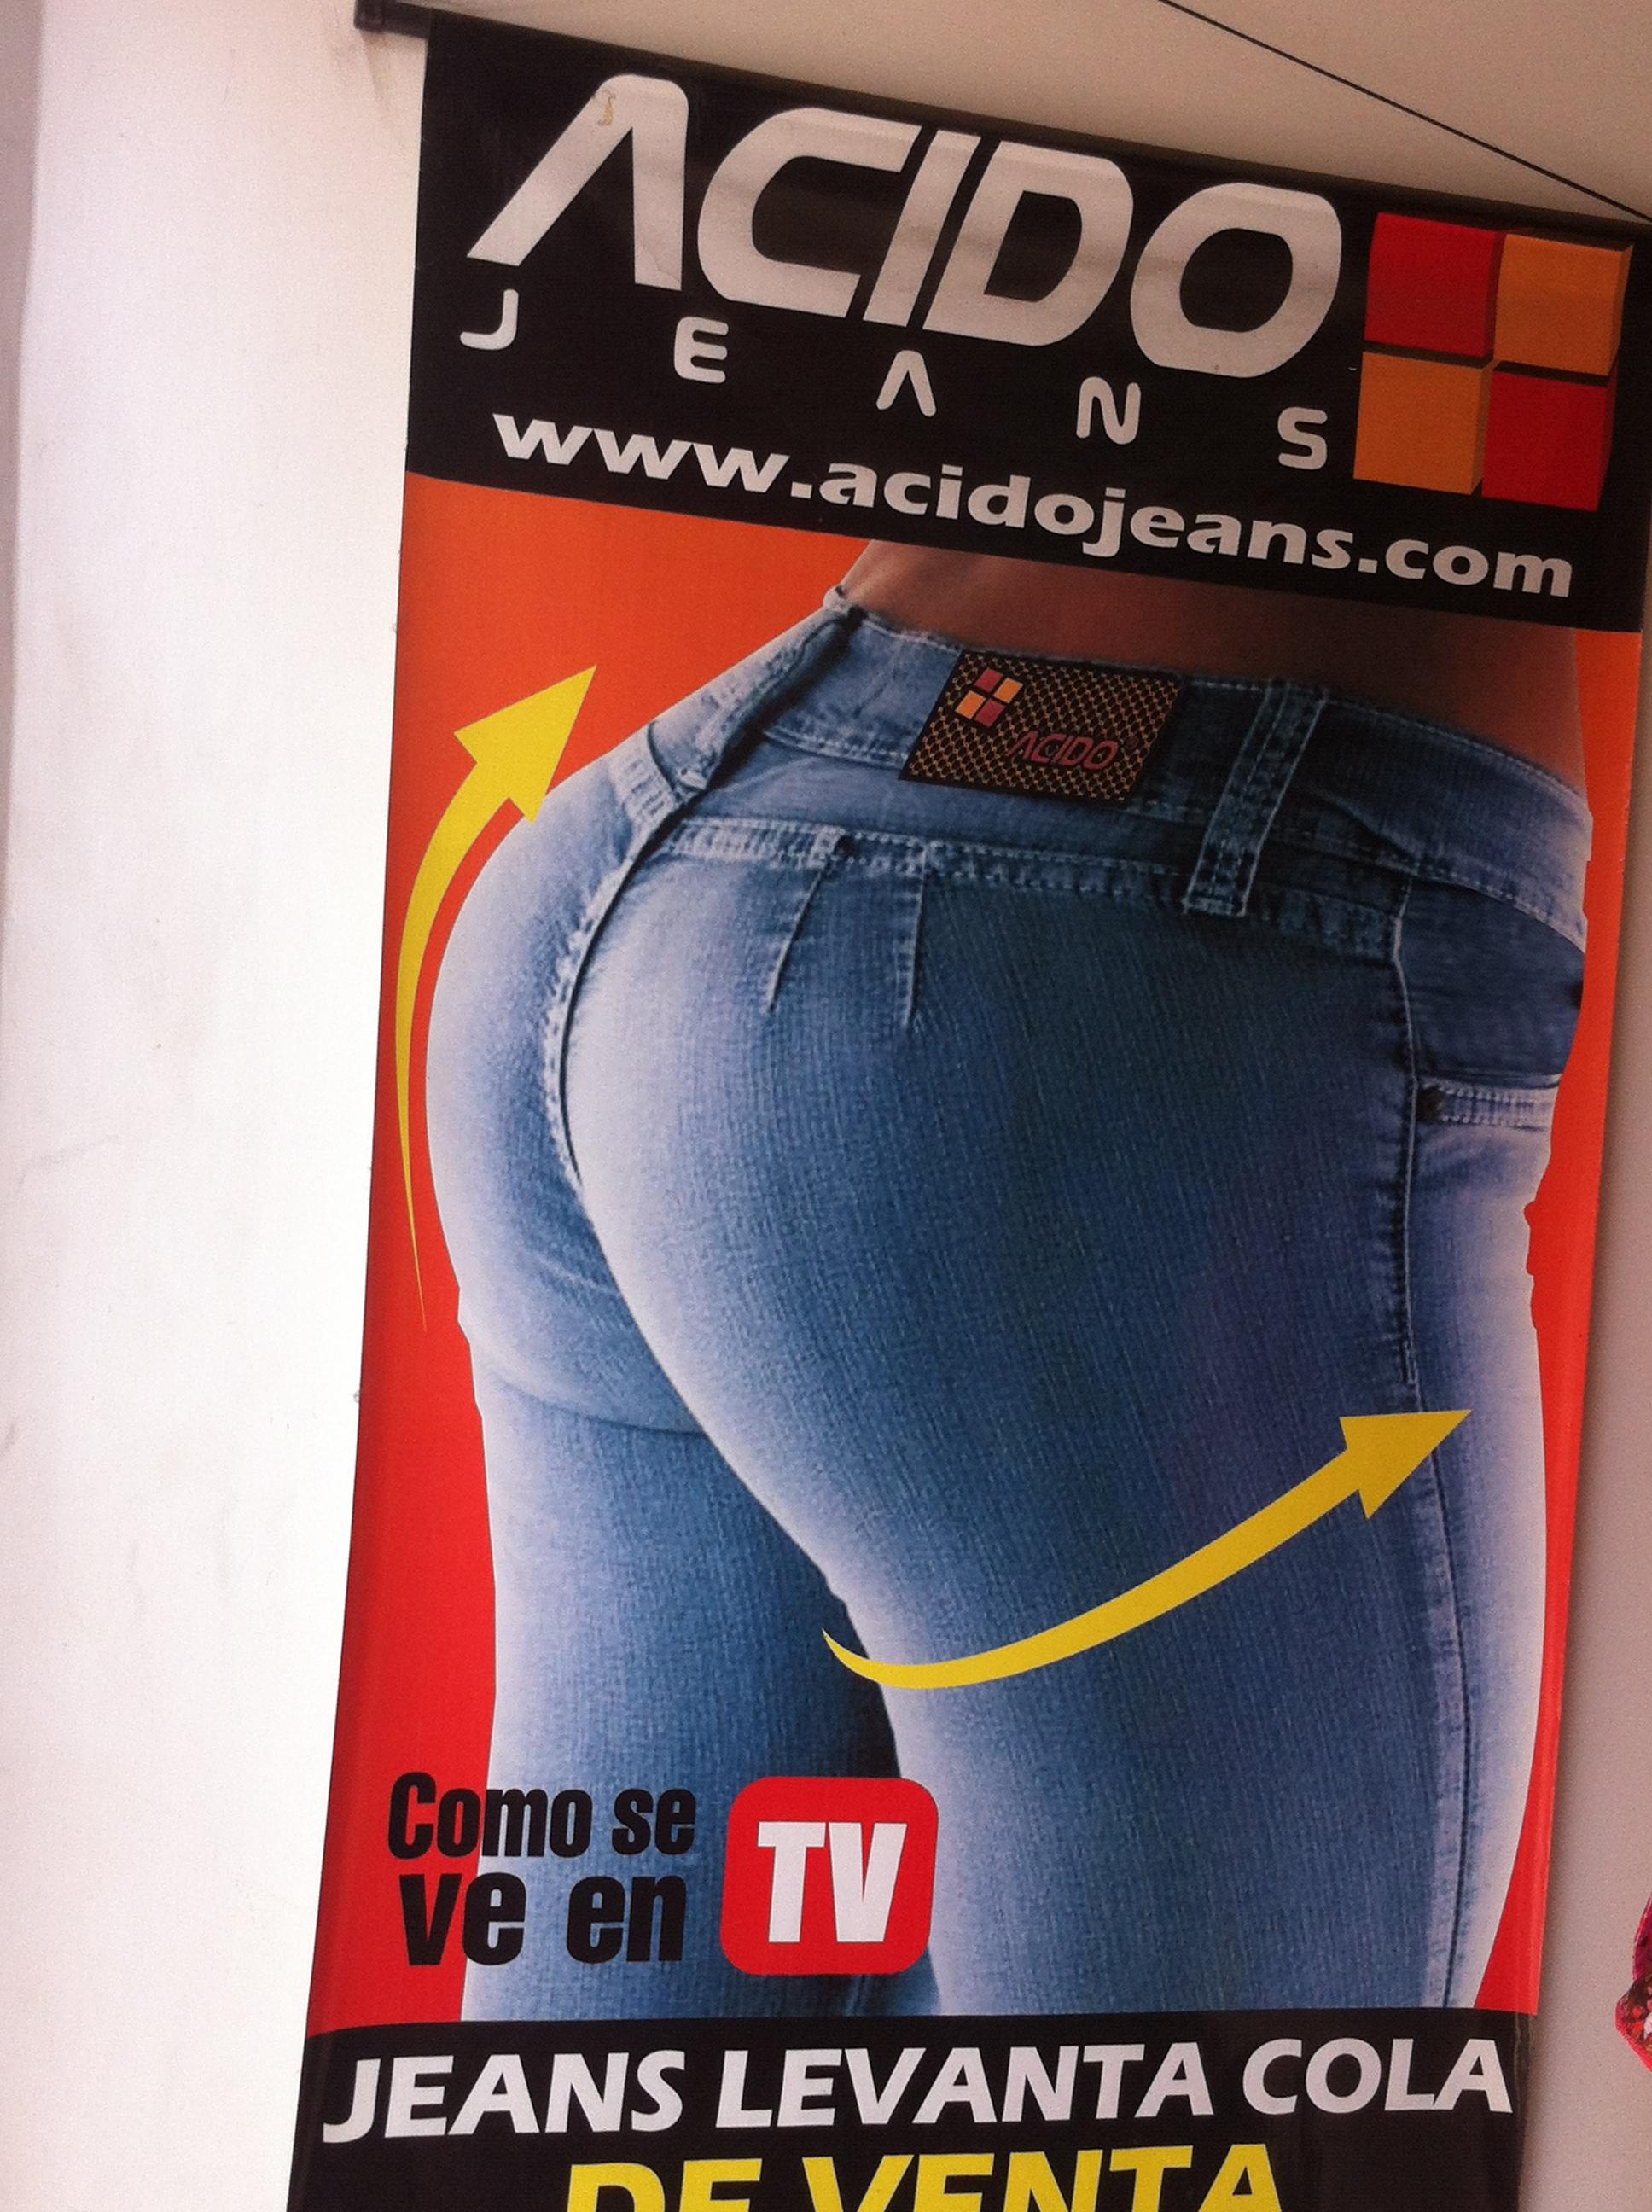 Magic jeans